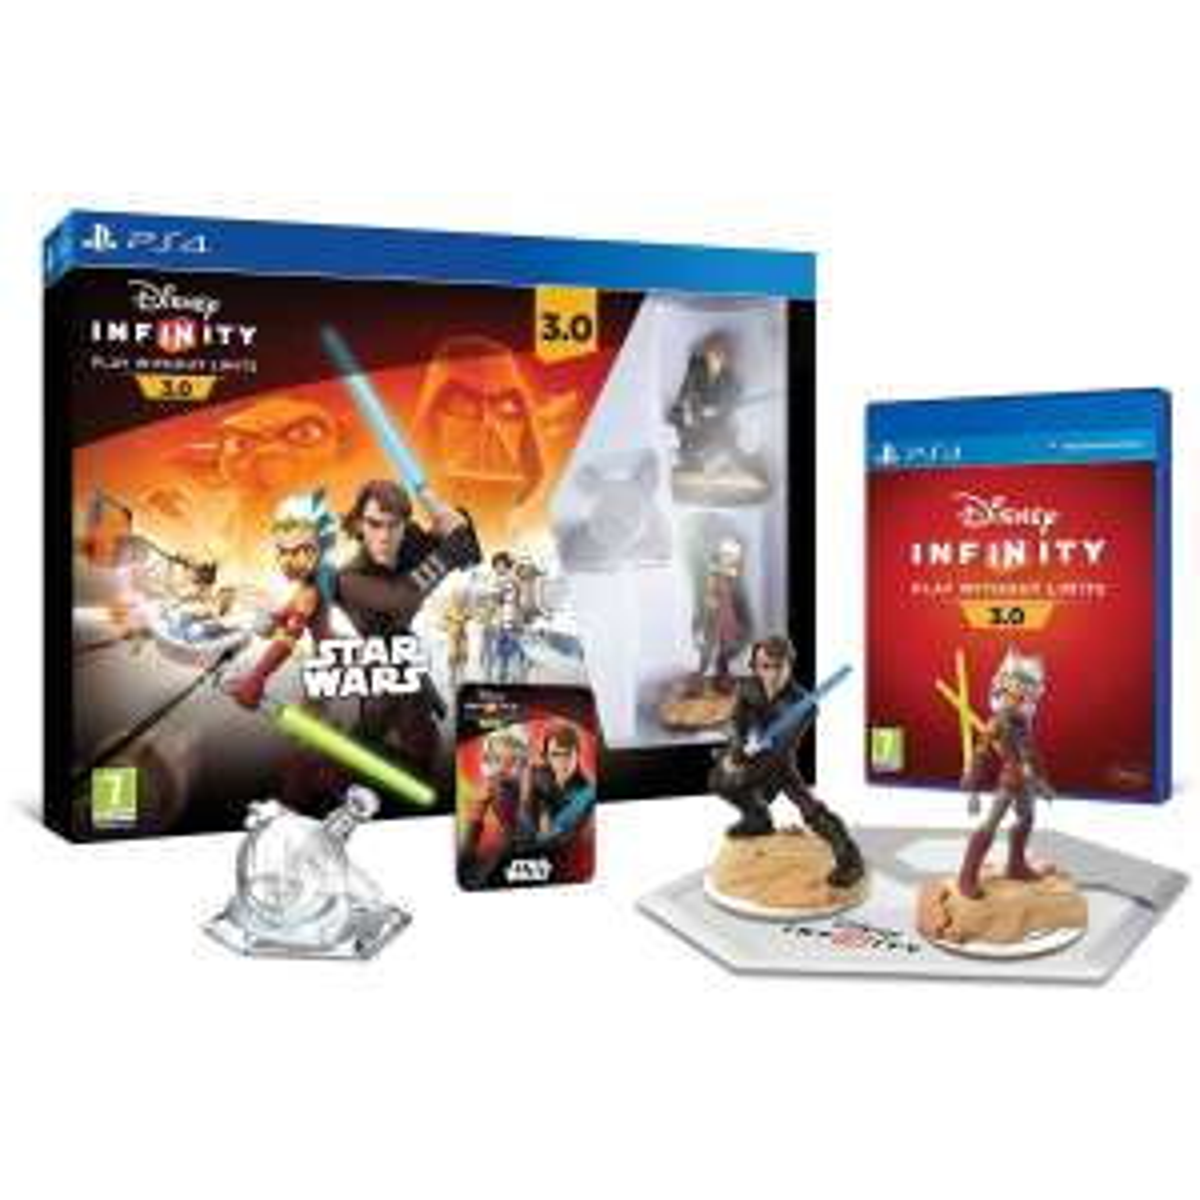 Pack de démarage Disney Infinity 3.0 Star Wars :  PS4, PS3, Xbox One, Xbox 360